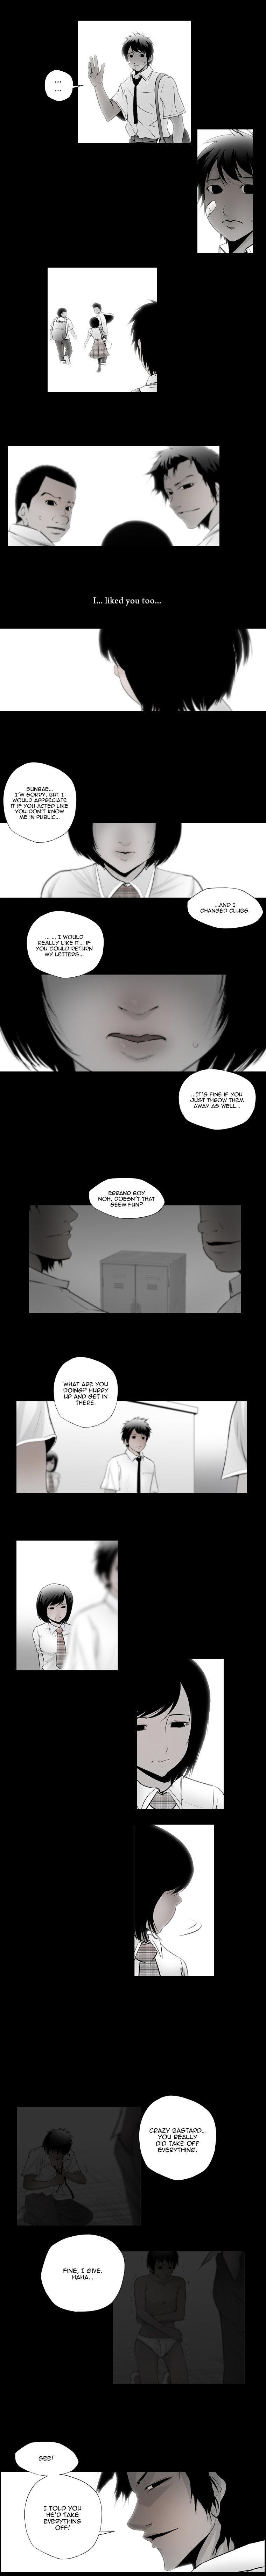 Banquet Box 21 Page 3